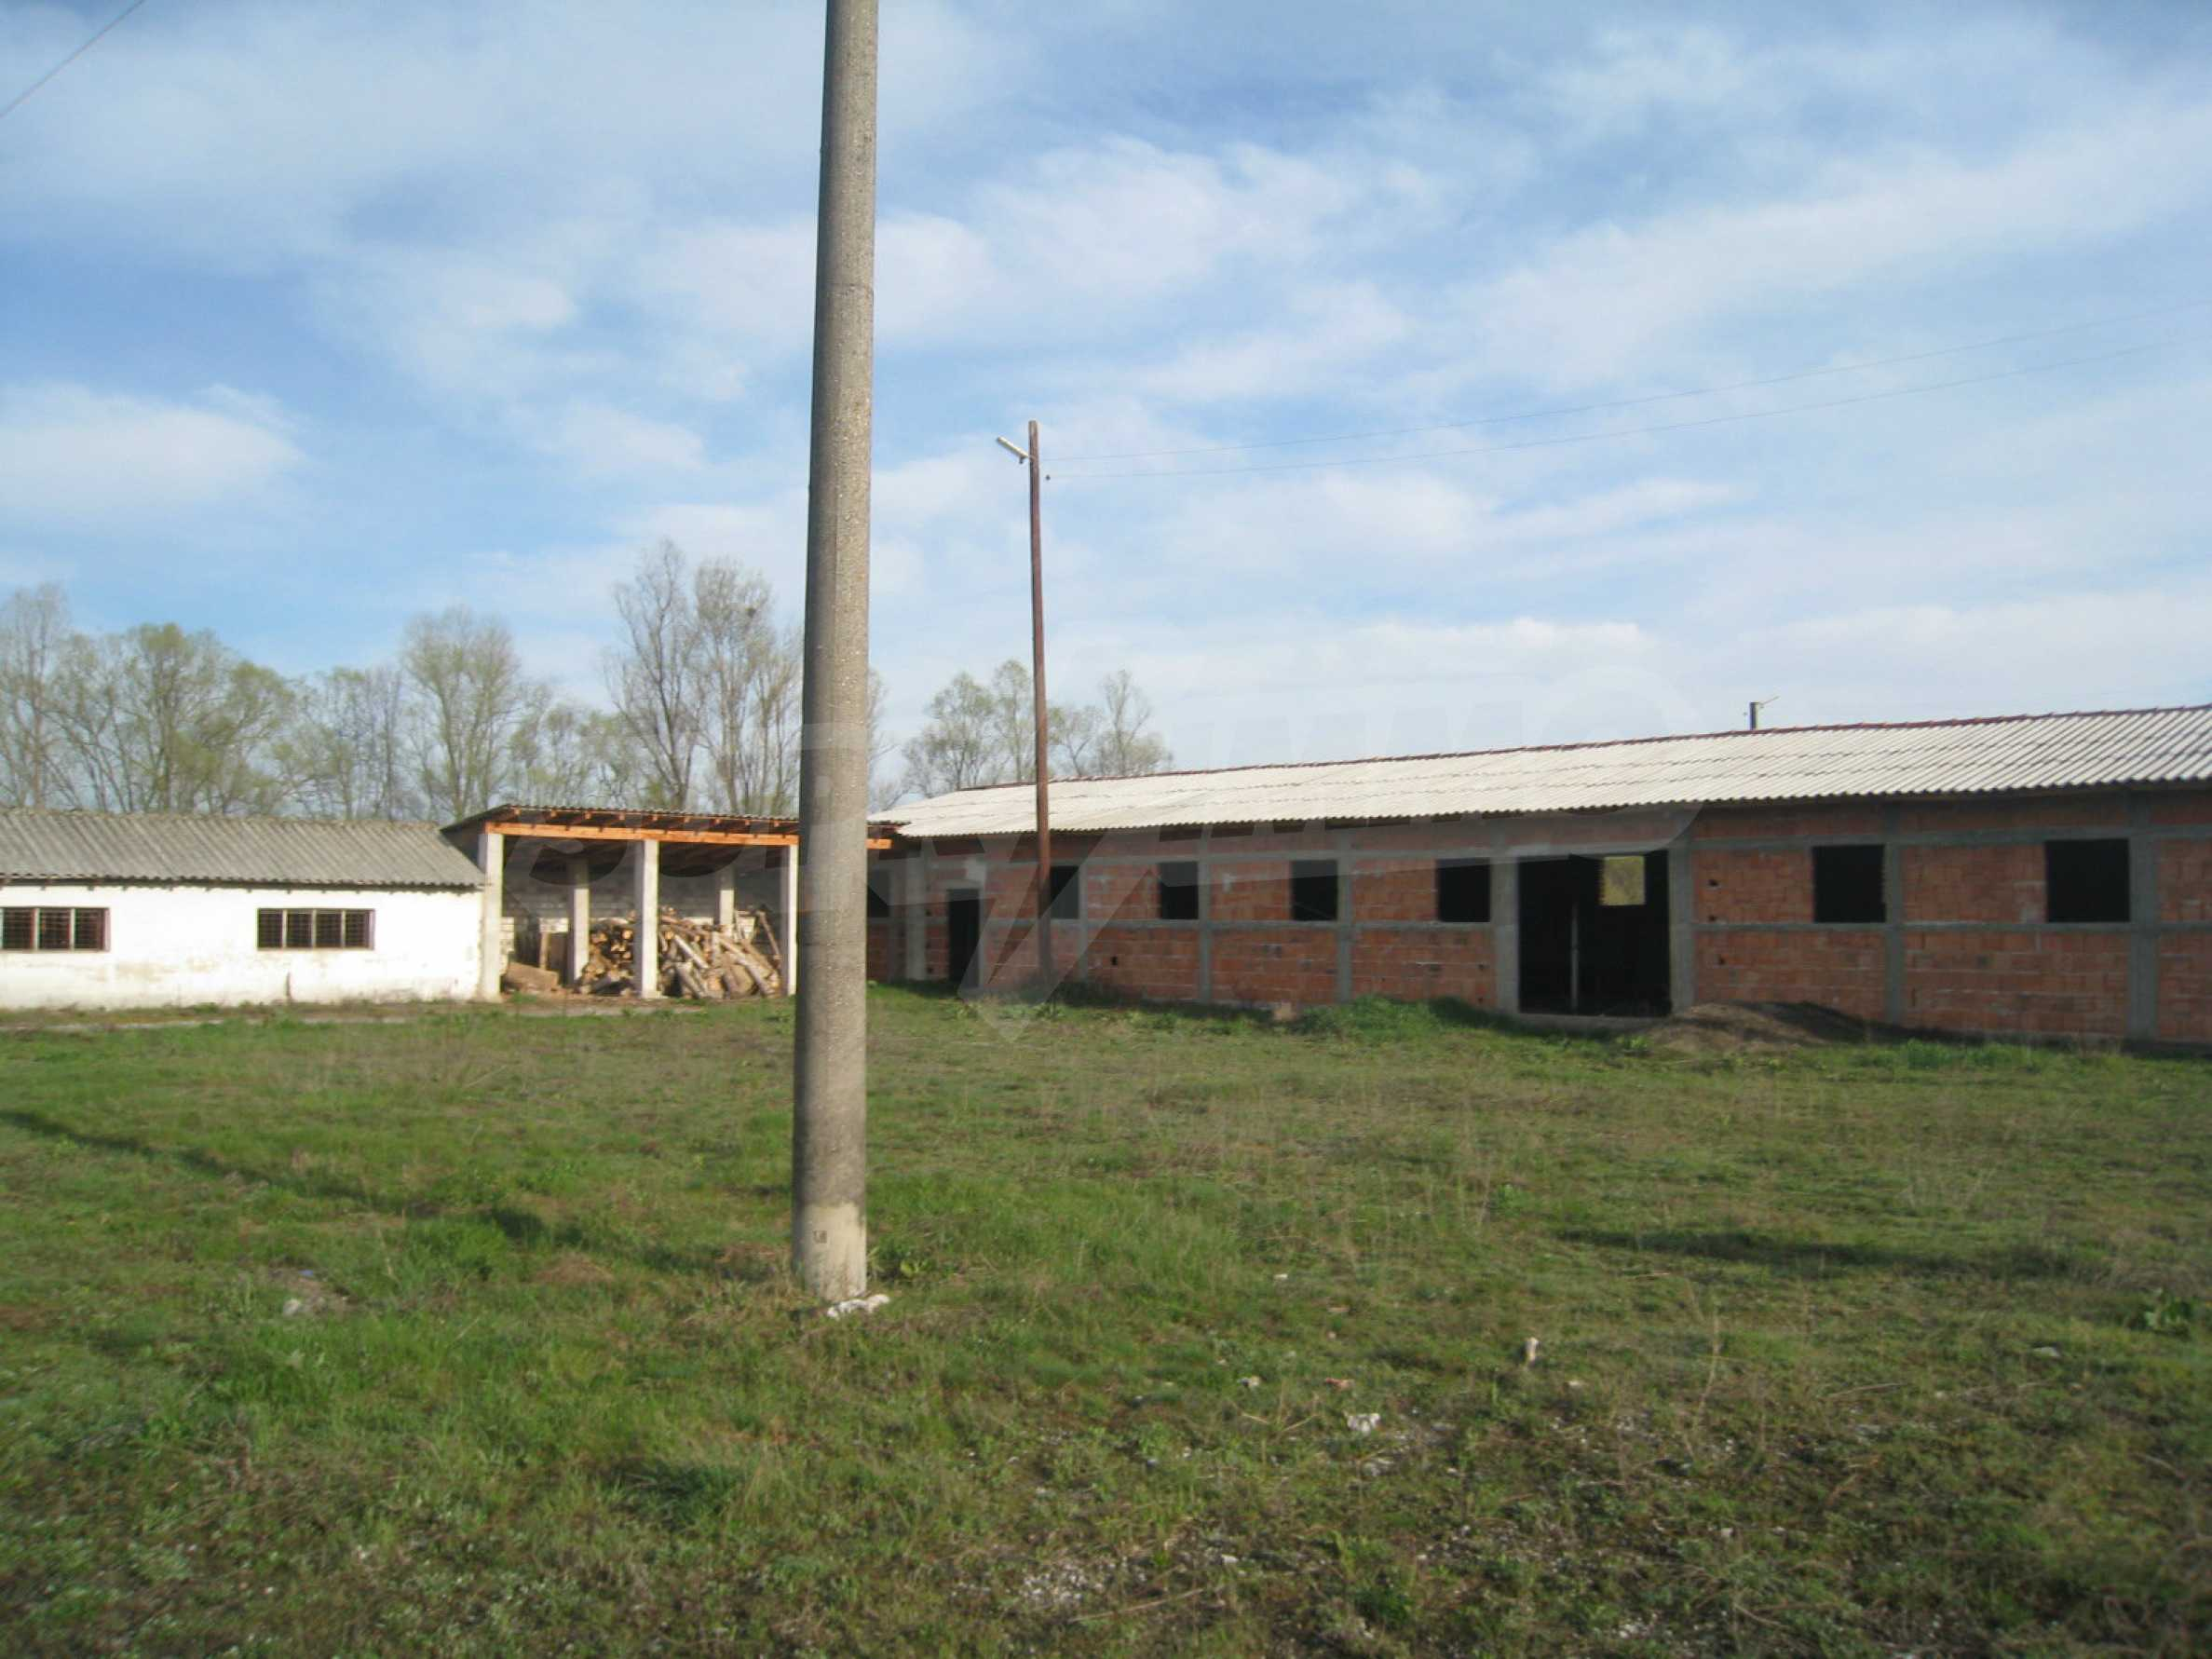 Fishpond, warehouses, residential areas and asphalt ground near Montana 35